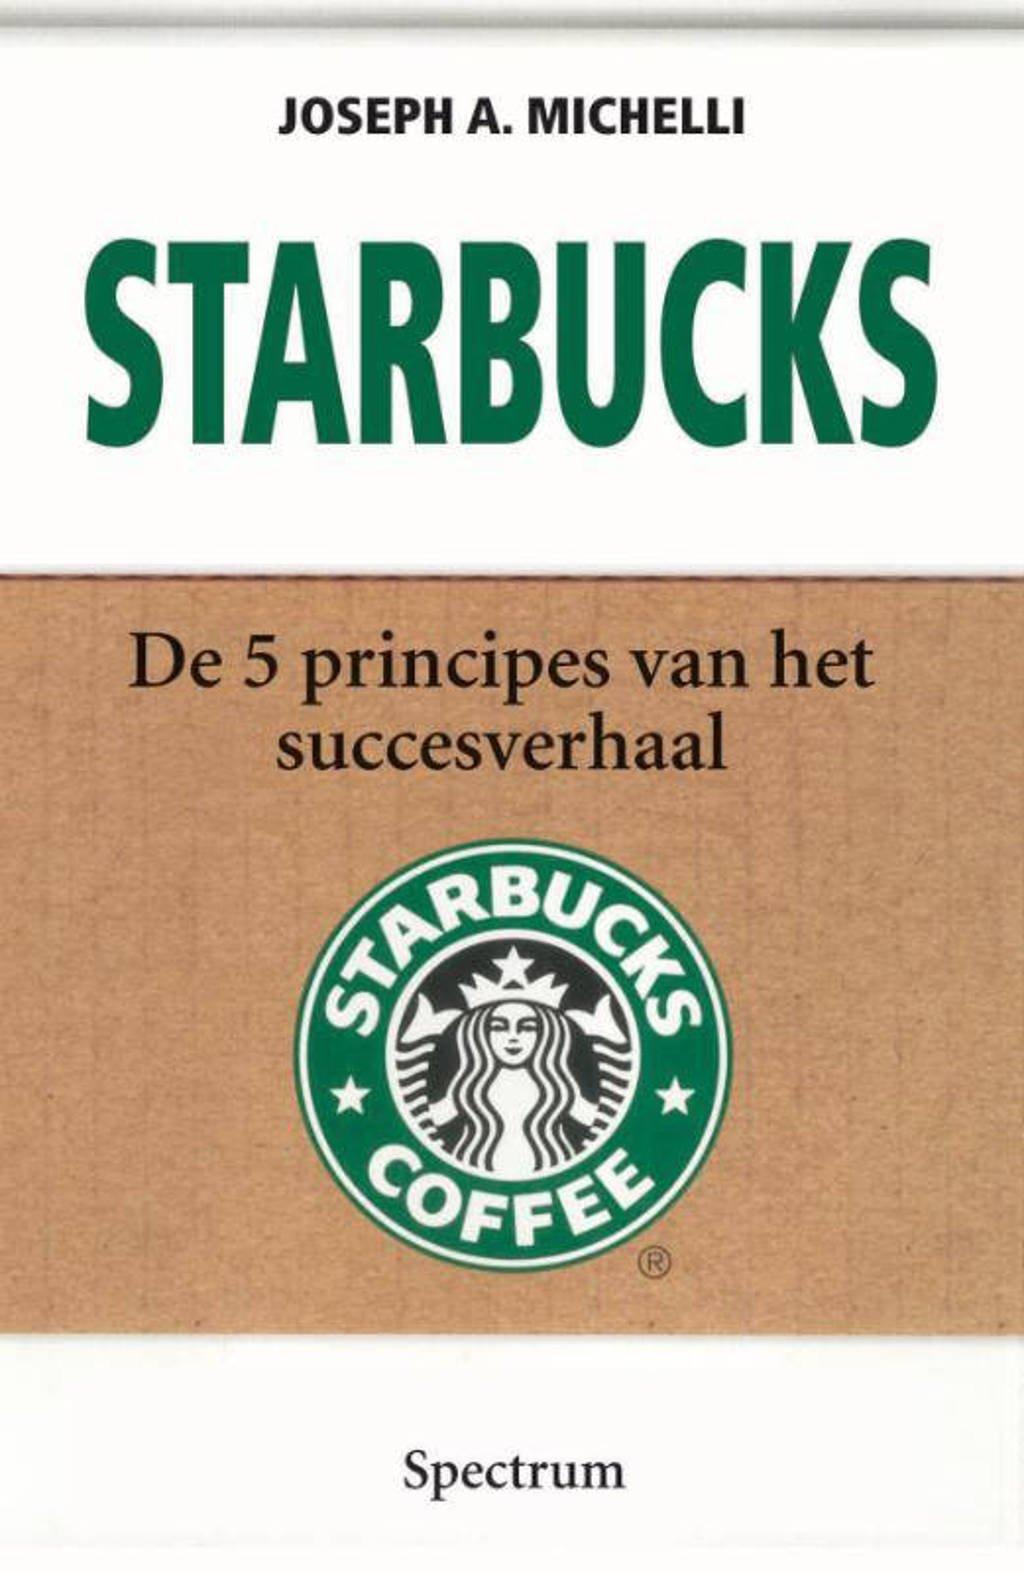 Starbucks - Joseph A. Michelli